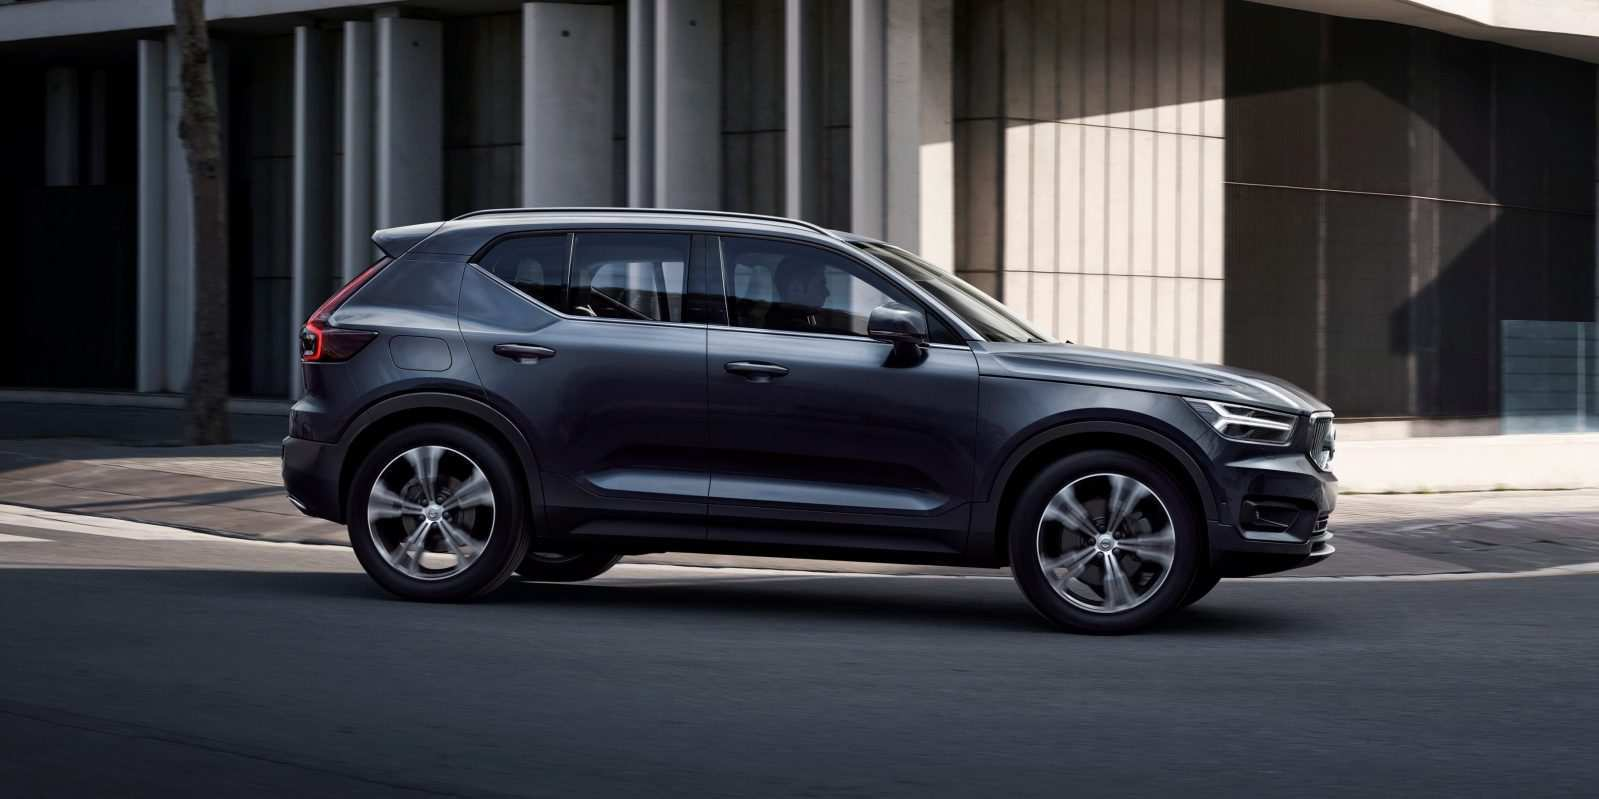 14 Great New Volvo 2019 Elektrisch Release Date And Specs Redesign and Concept by New Volvo 2019 Elektrisch Release Date And Specs